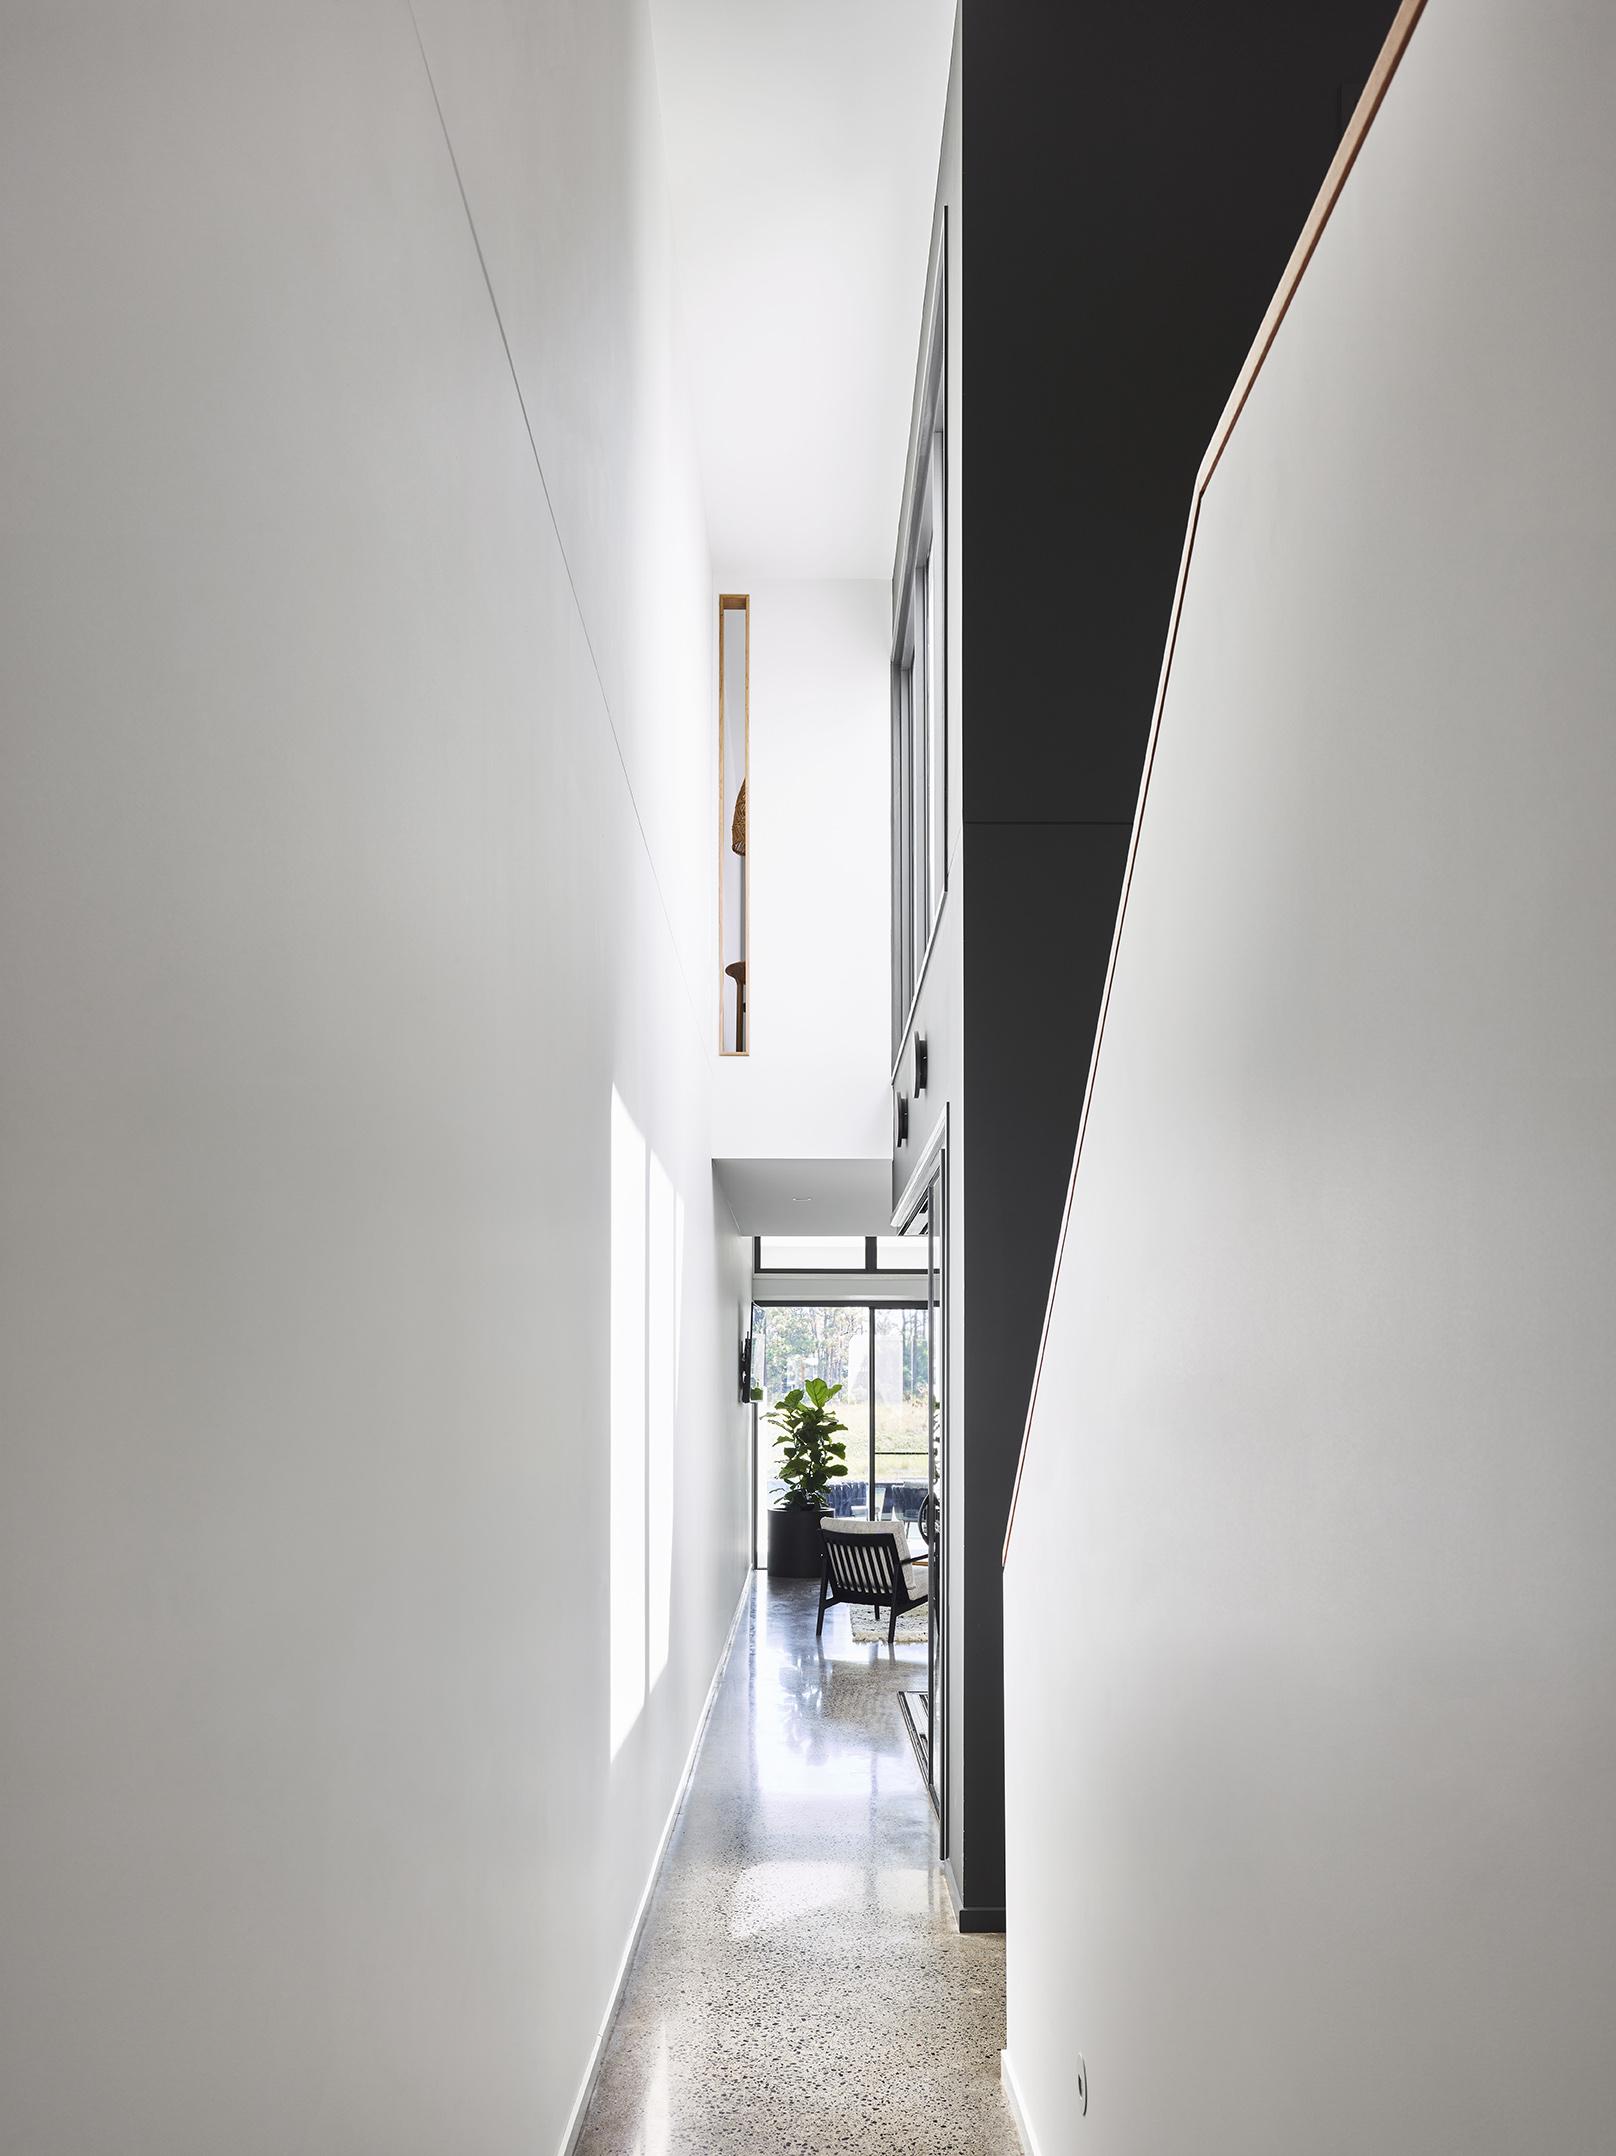 Langsford Cres House - Maytres Studios69248.jpg